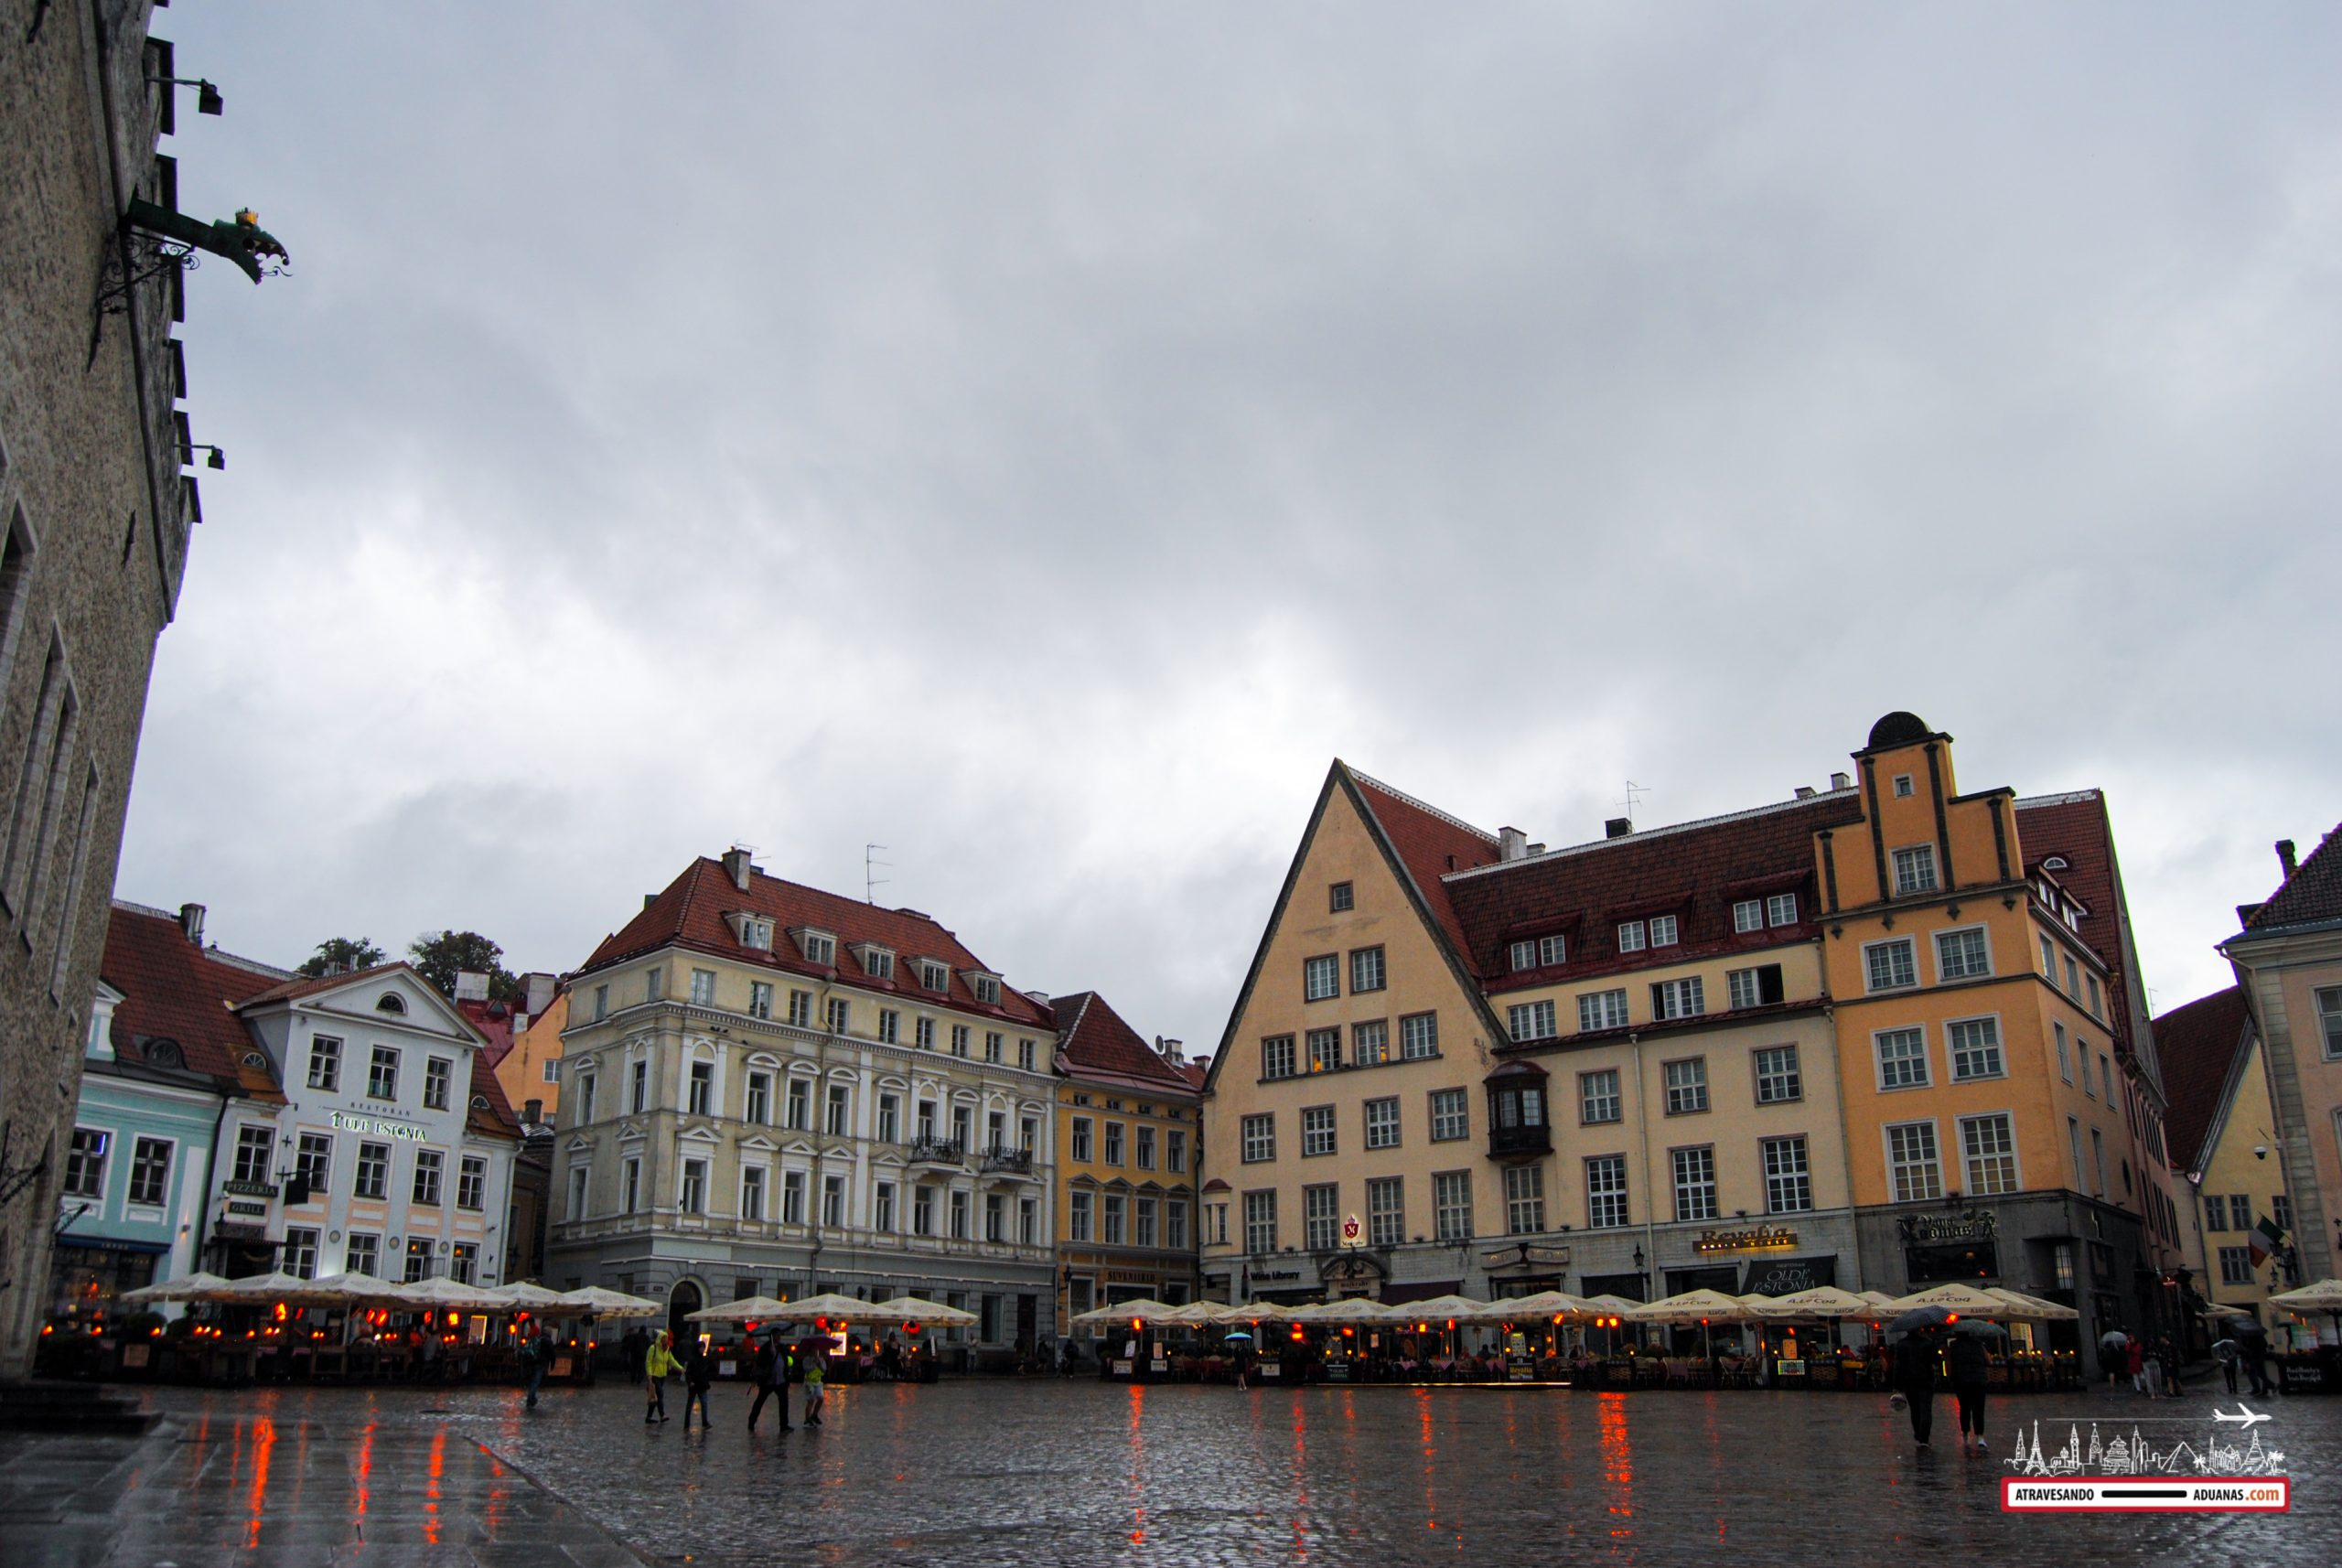 Plaza del ayuntamiento de Tallinn, estonia